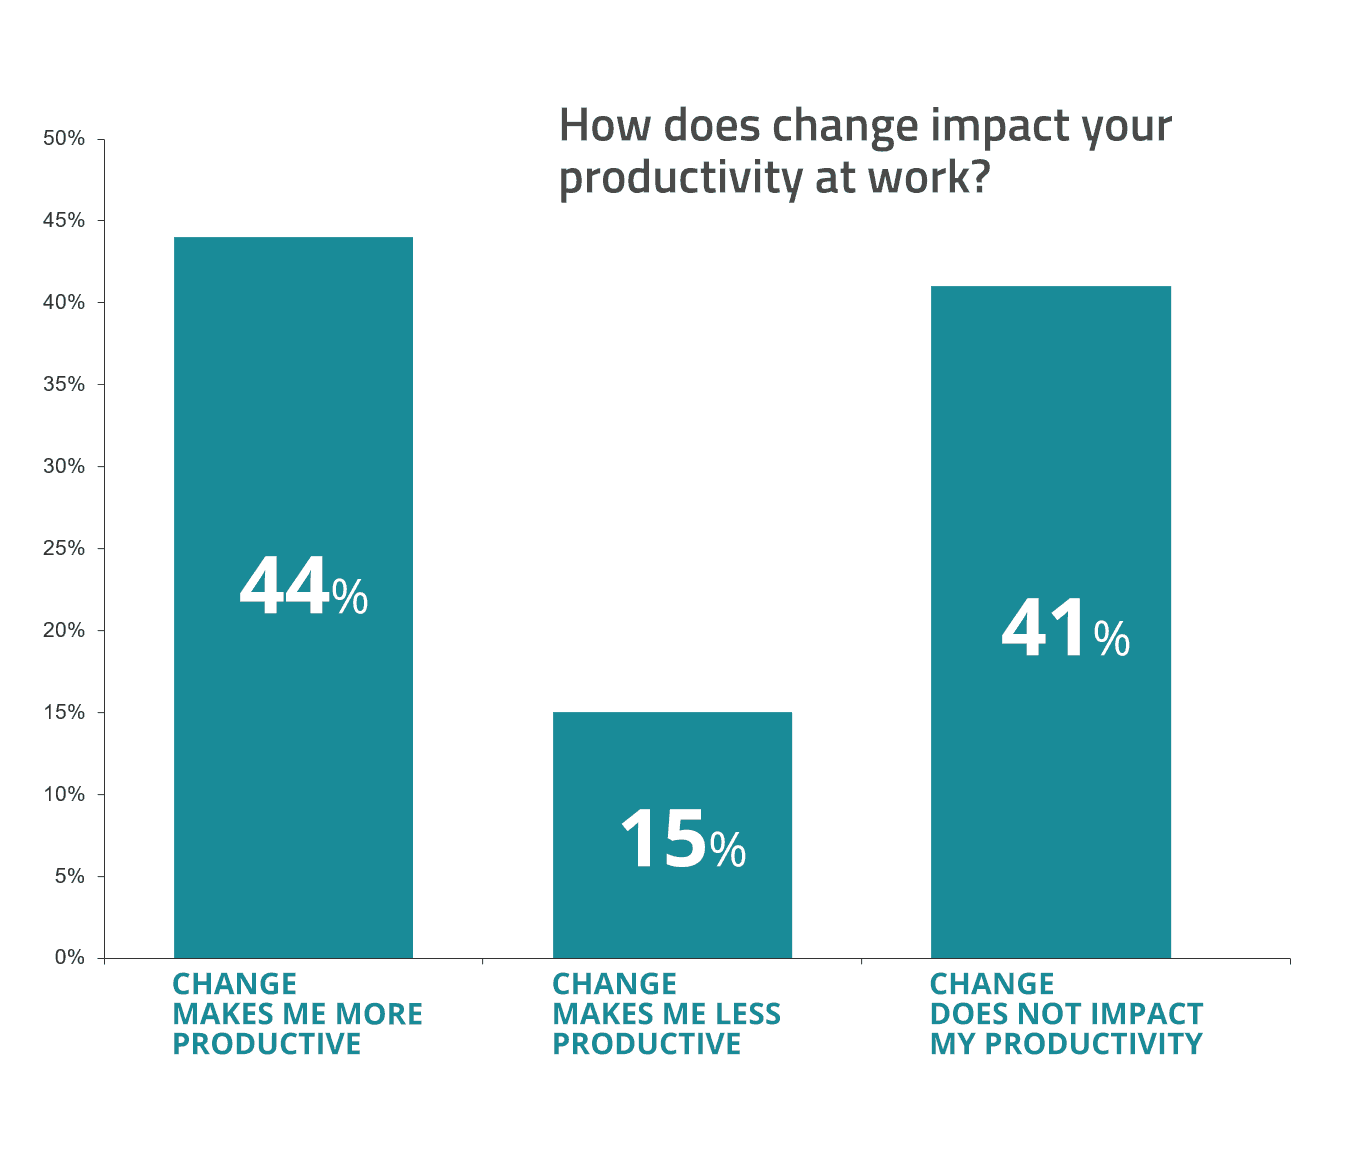 change at work chart - impact productivity